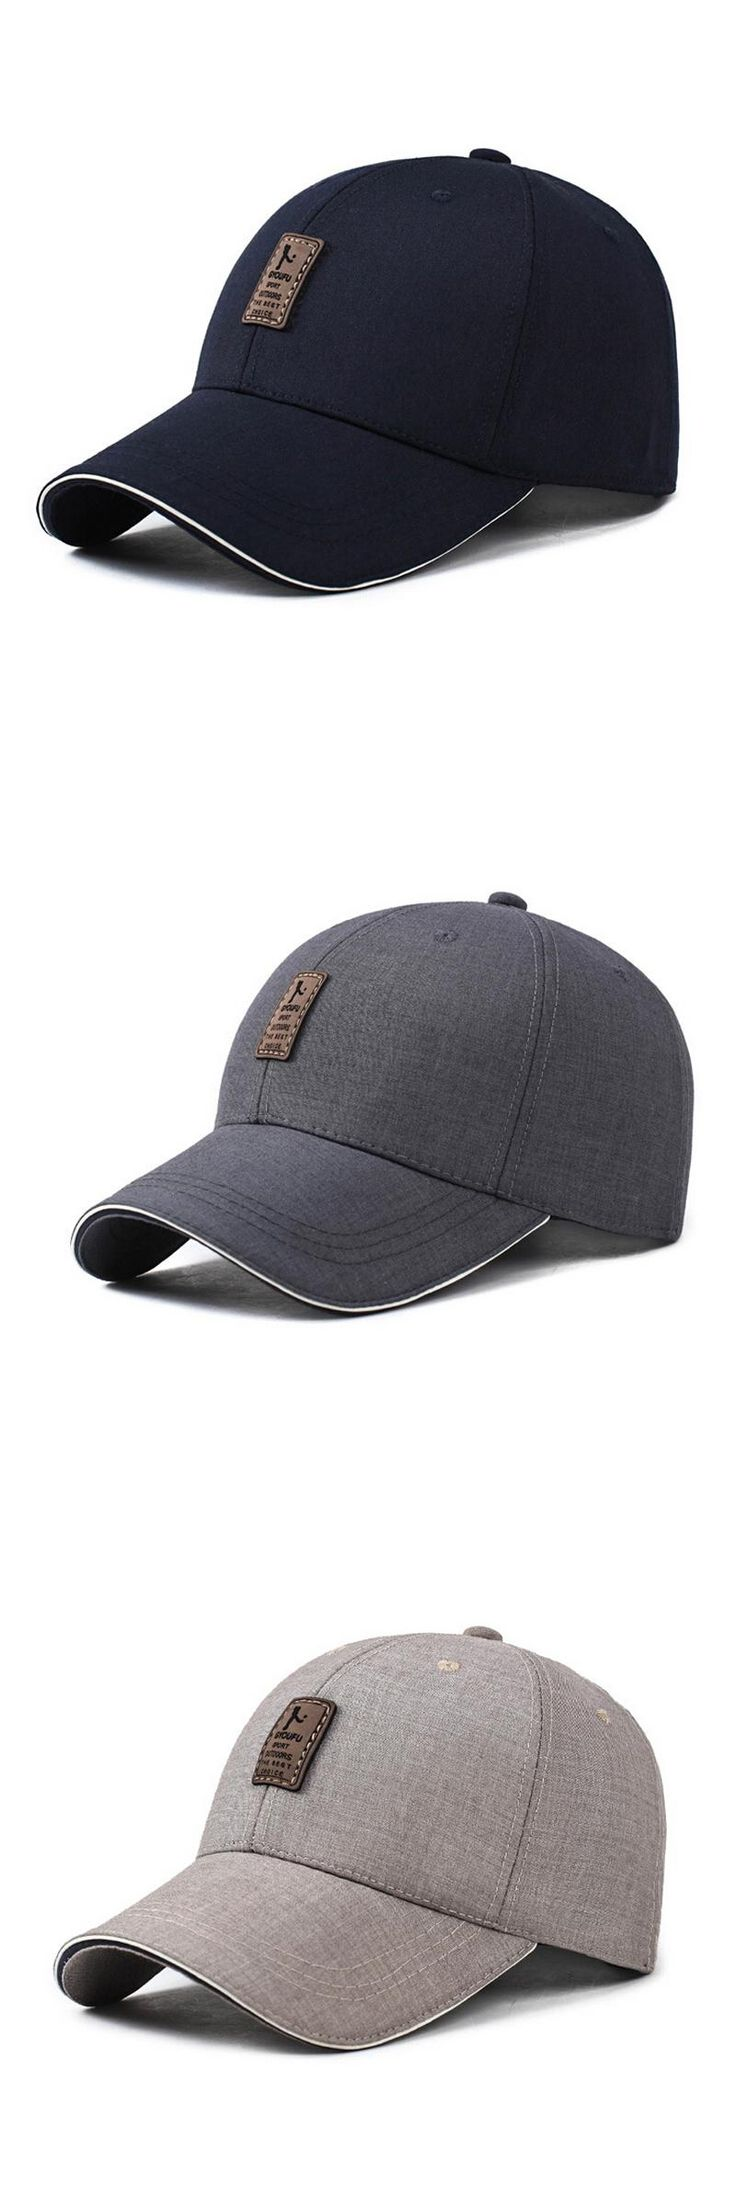 [Visit to Buy] 2017 Summer men's mesh baseball caps men breathable bones snapback caps male golf hats casquette gorras dad caps drake outdoor #Advertisement